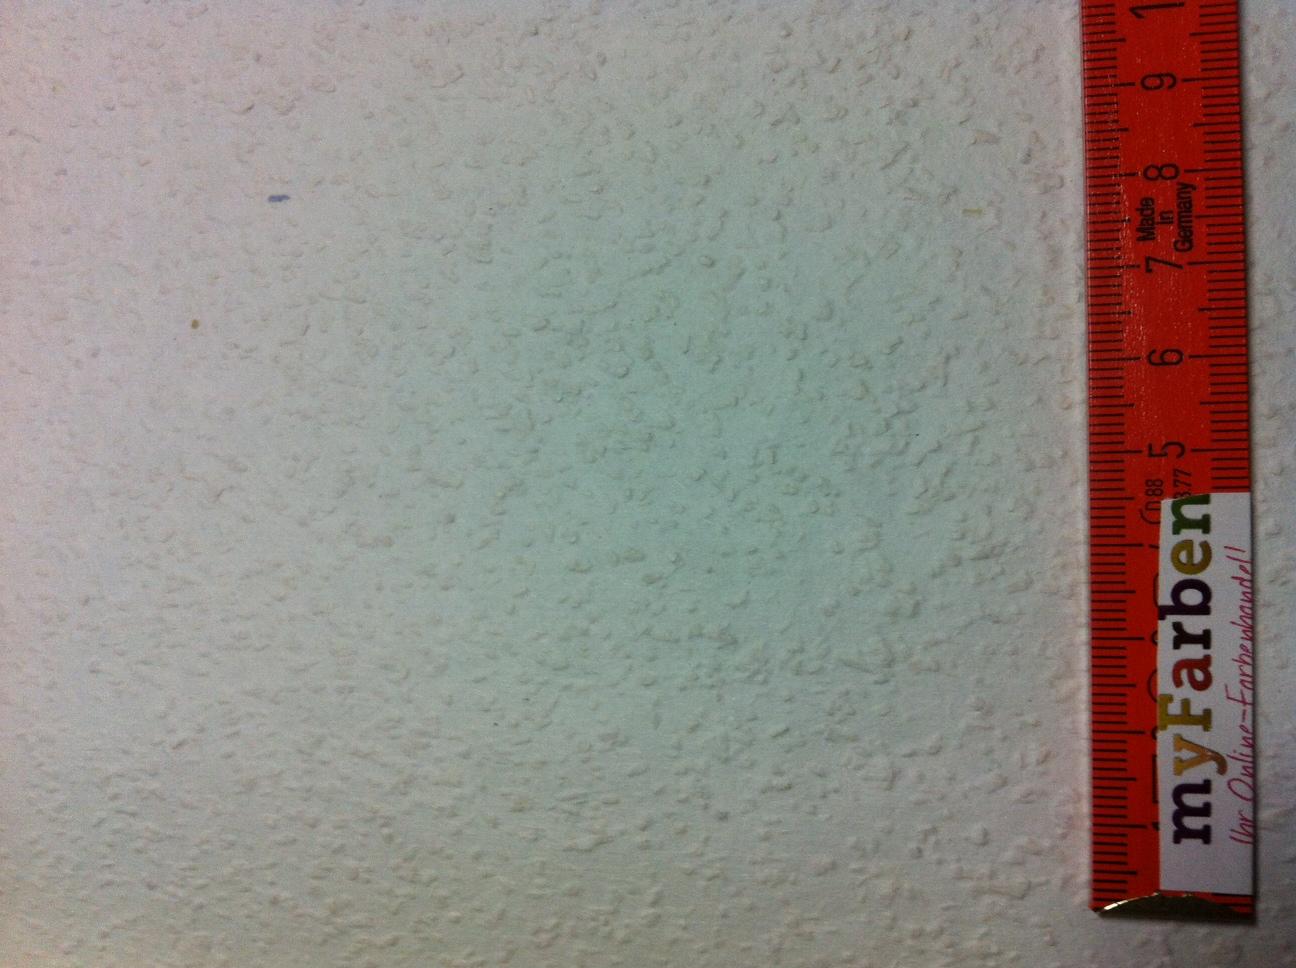 erfurt rauhfaser tapete nr 40 33 5 meter. Black Bedroom Furniture Sets. Home Design Ideas